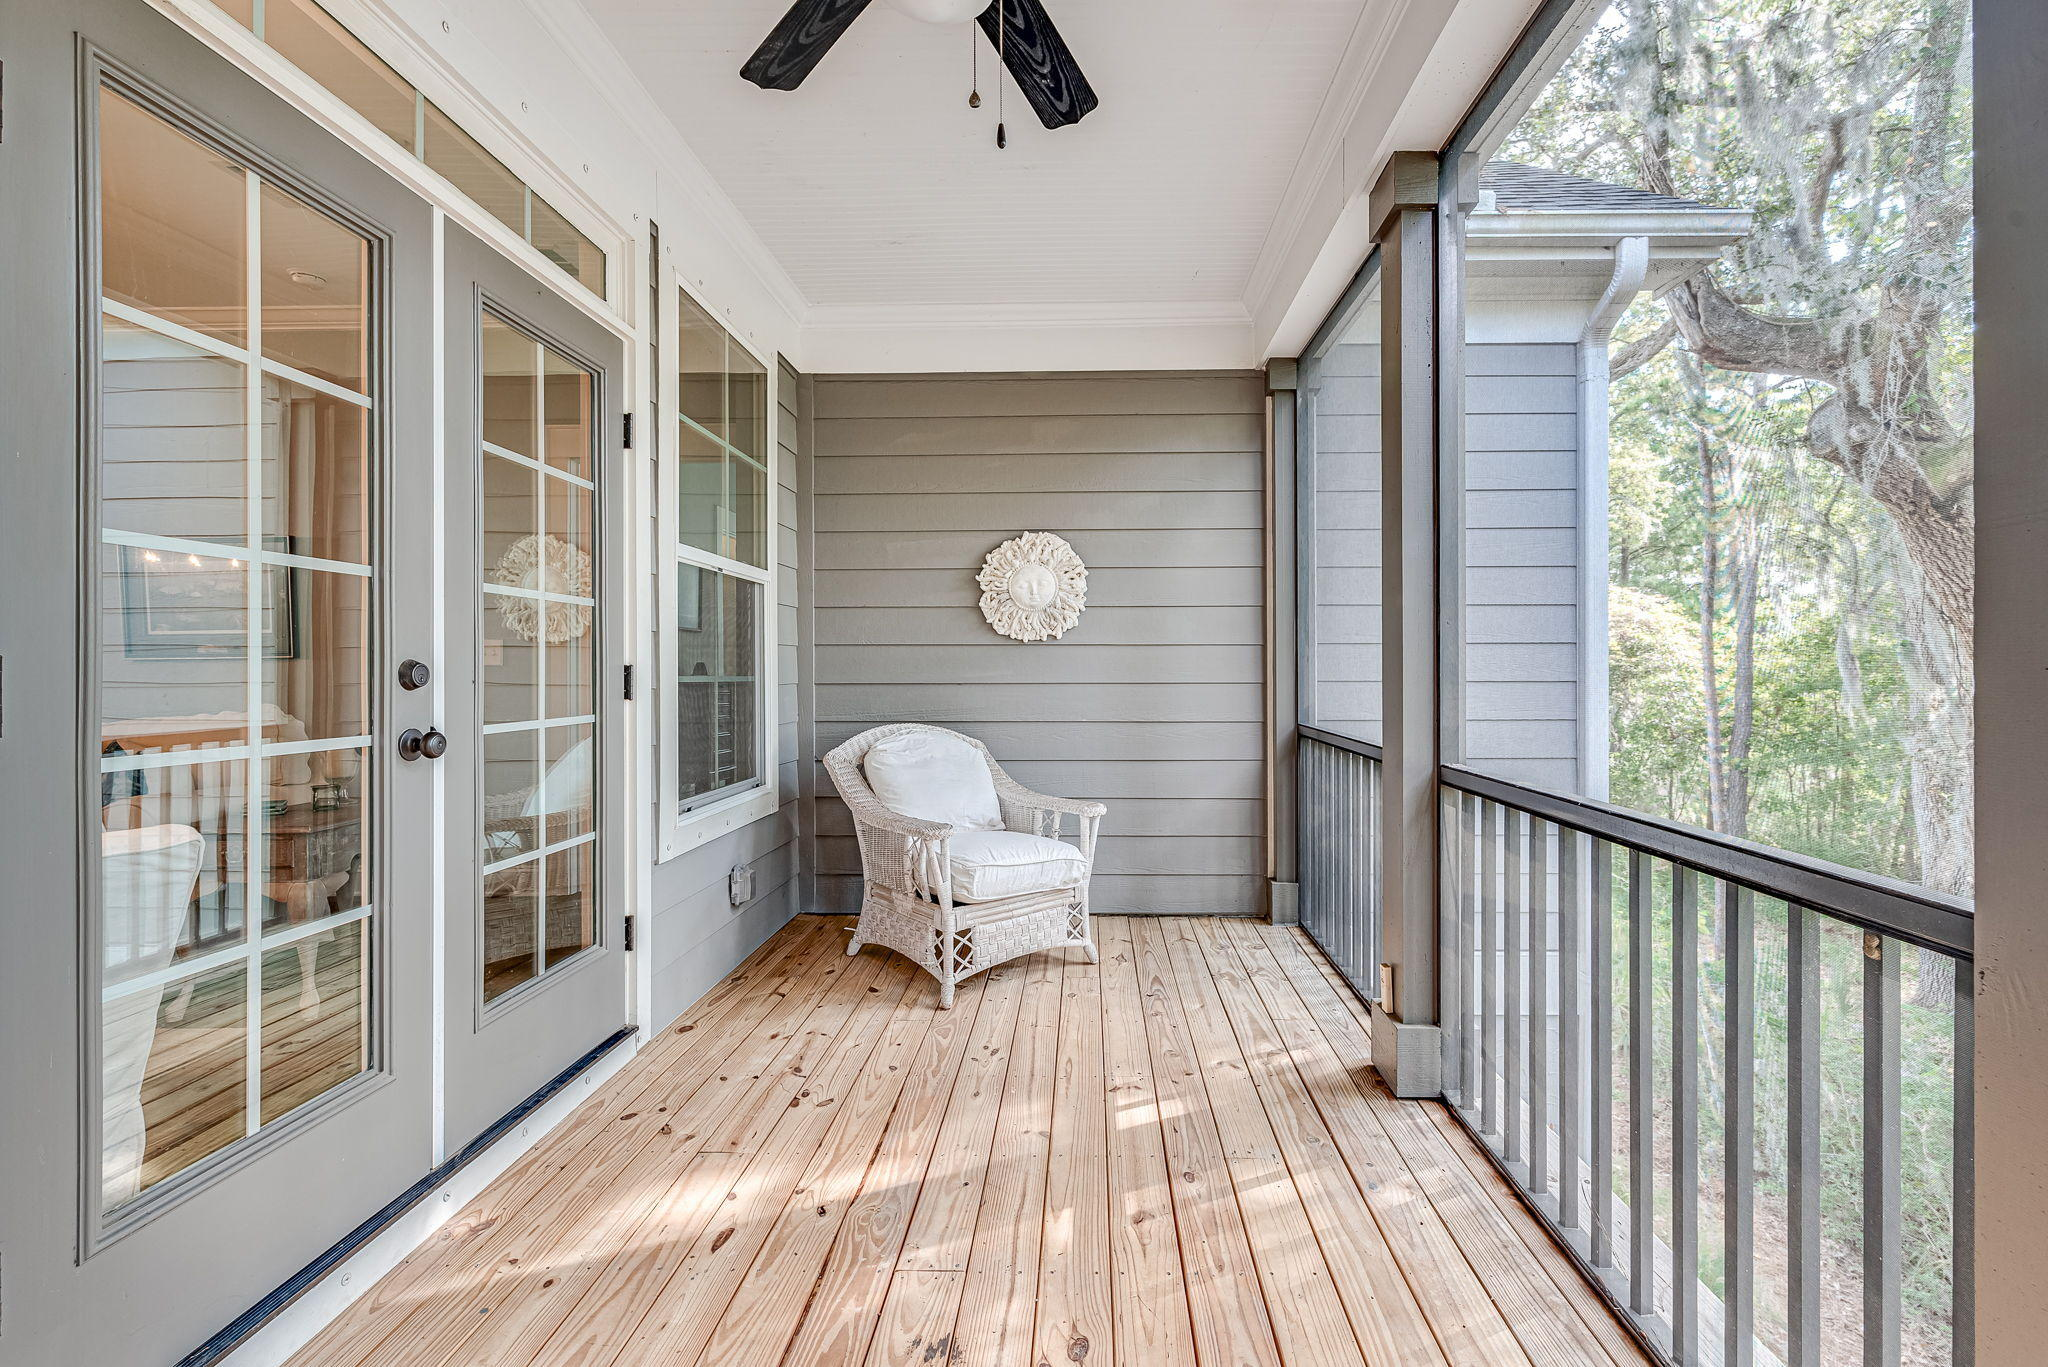 Etiwan Pointe Homes For Sale - 159 Slipper Shell, Mount Pleasant, SC - 30